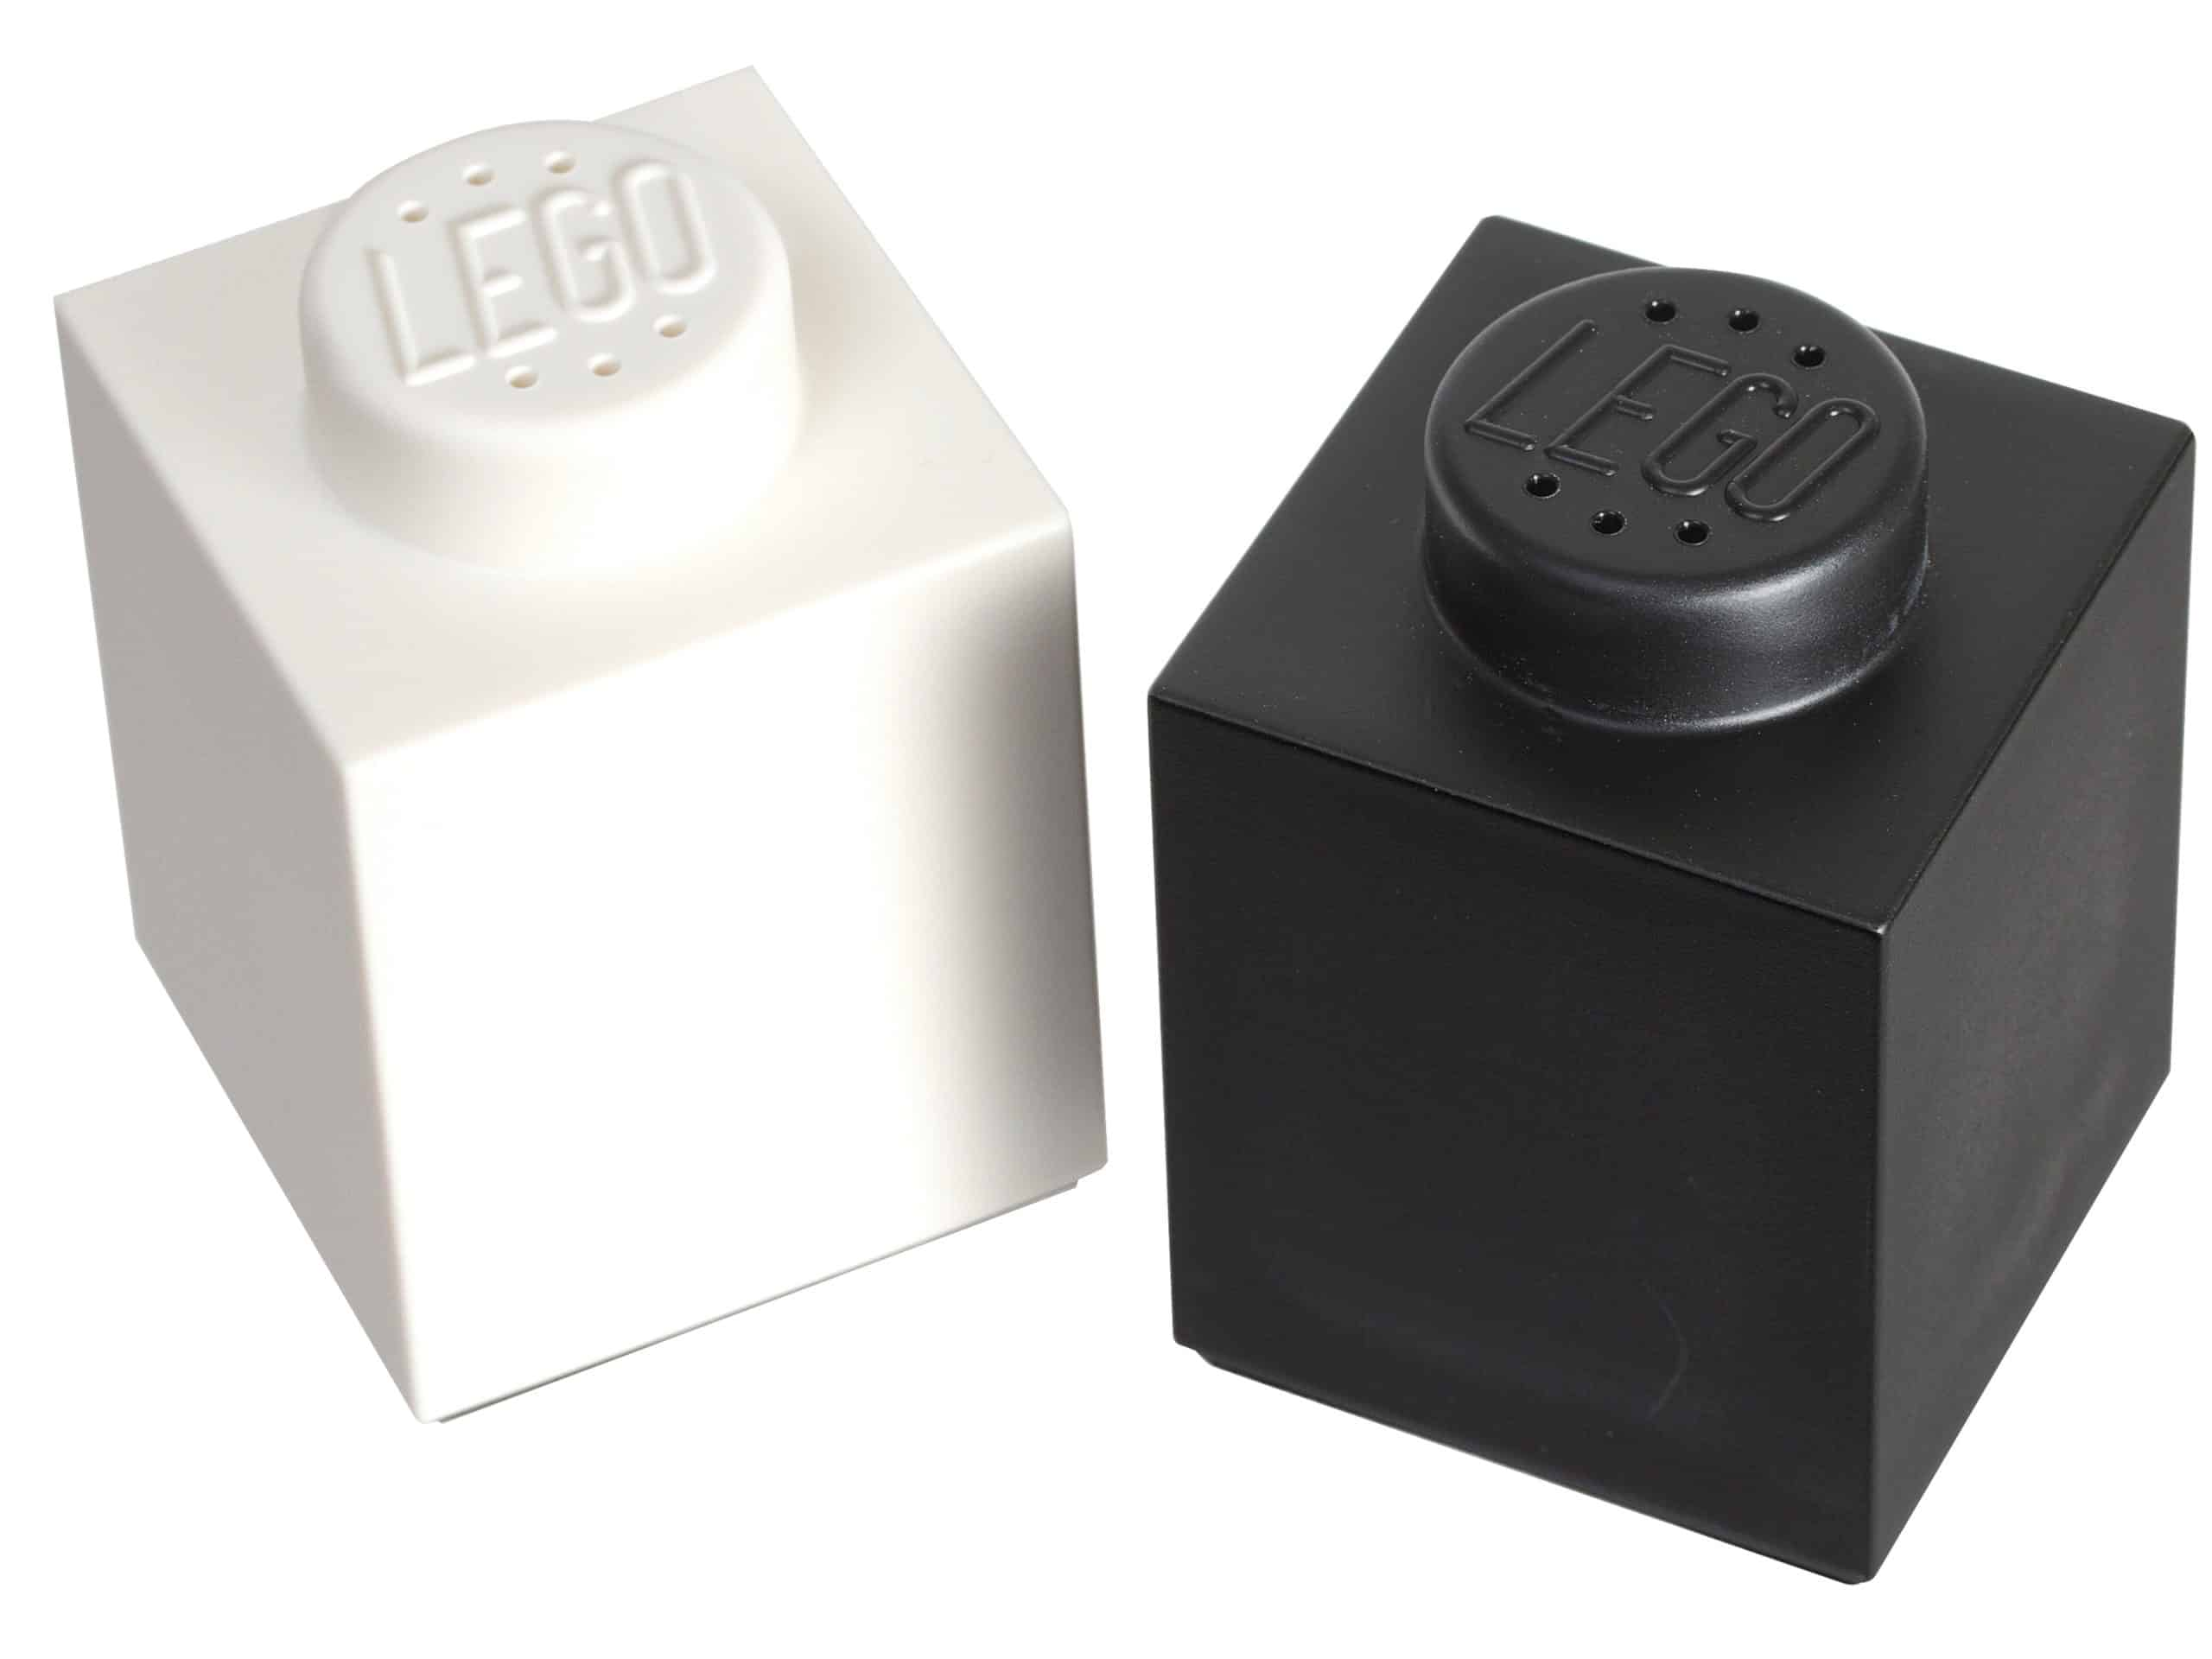 lego 850705 salz und pfefferstreuer scaled